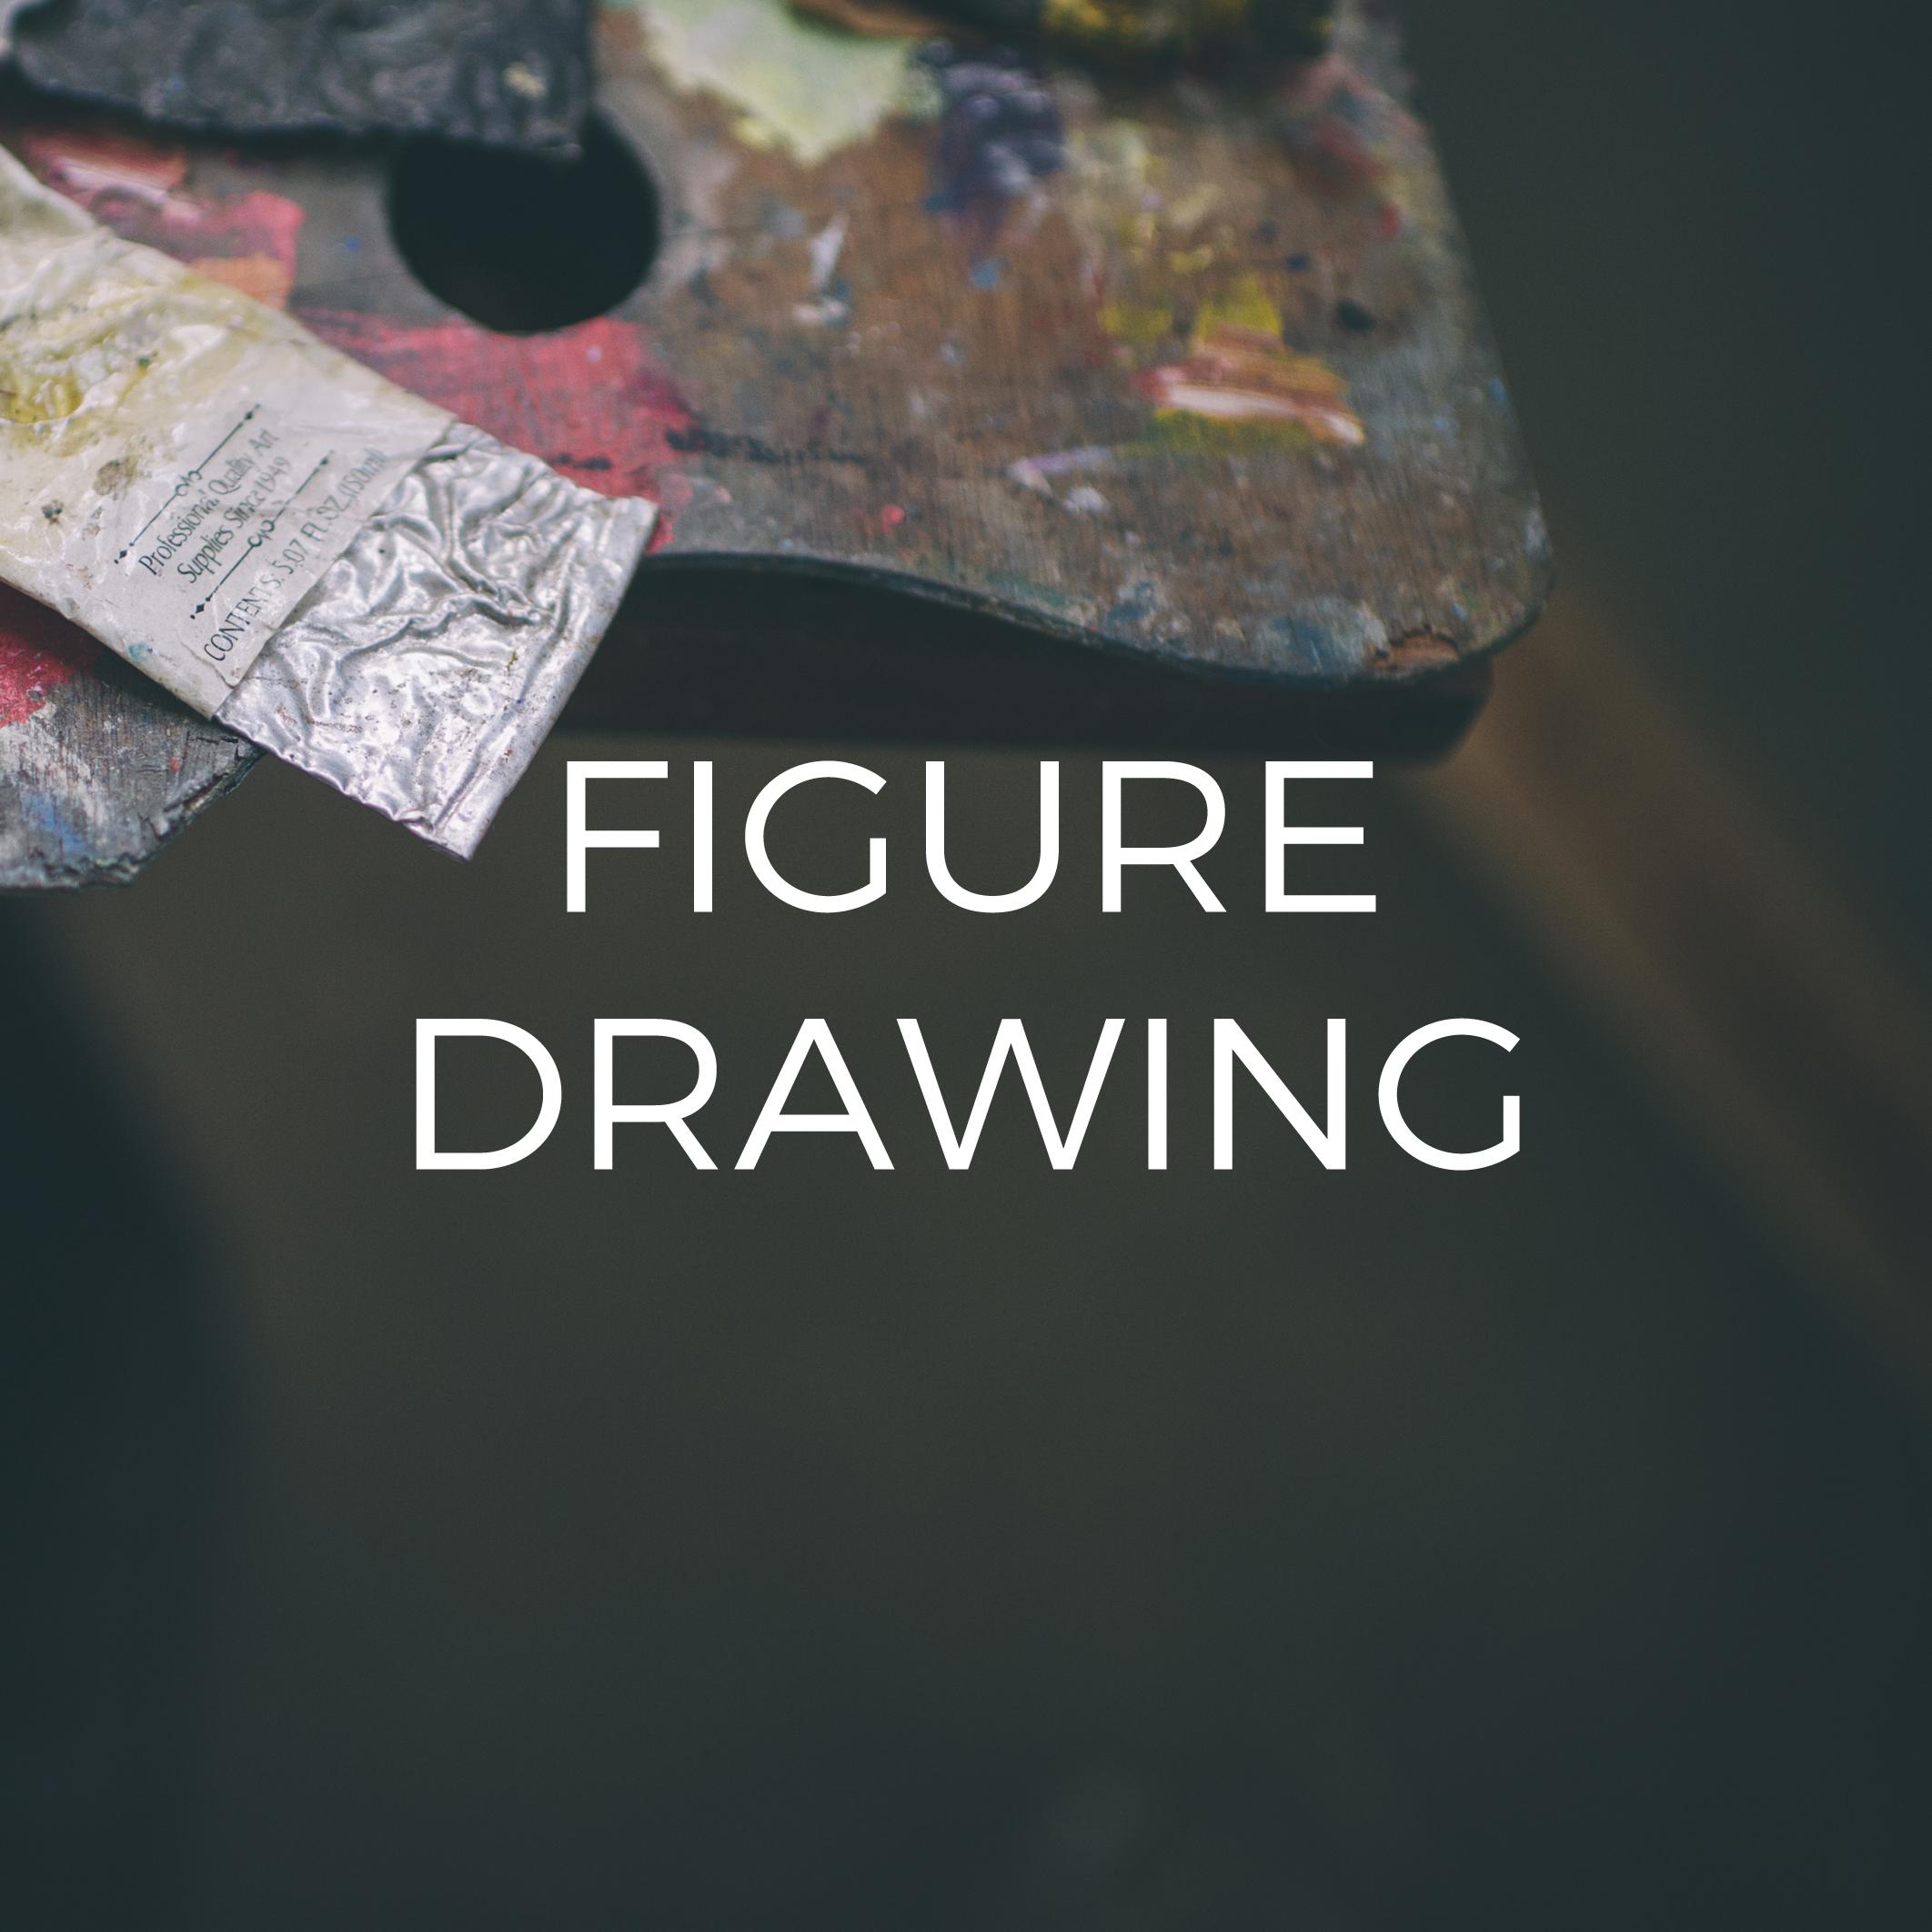 figuredrawing.jpg